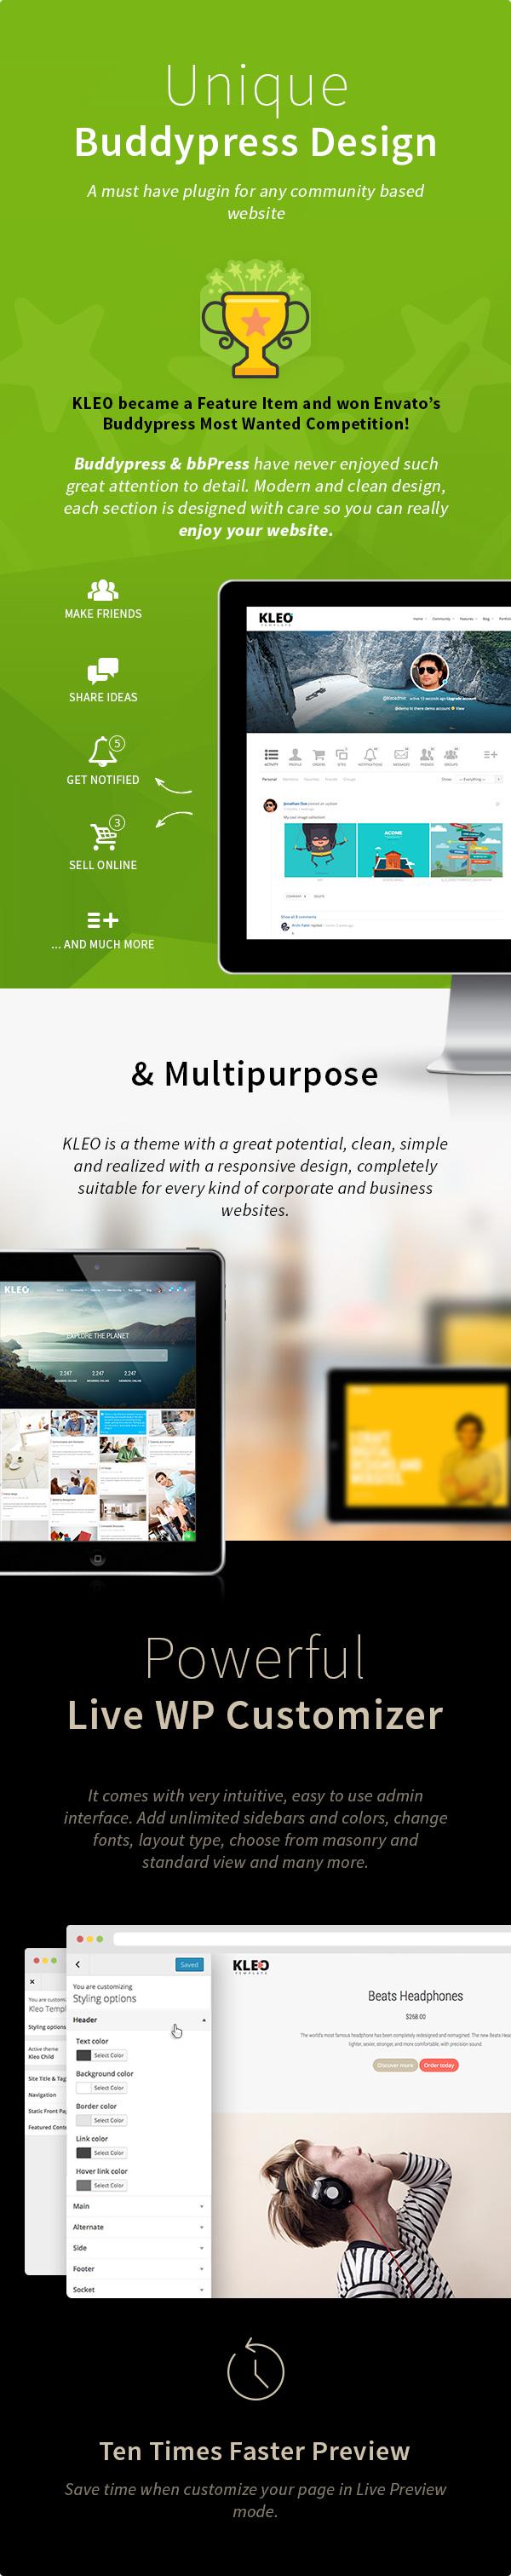 kleo7 - KLEO - Pro Community Focused, Multi-Purpose BuddyPress Theme